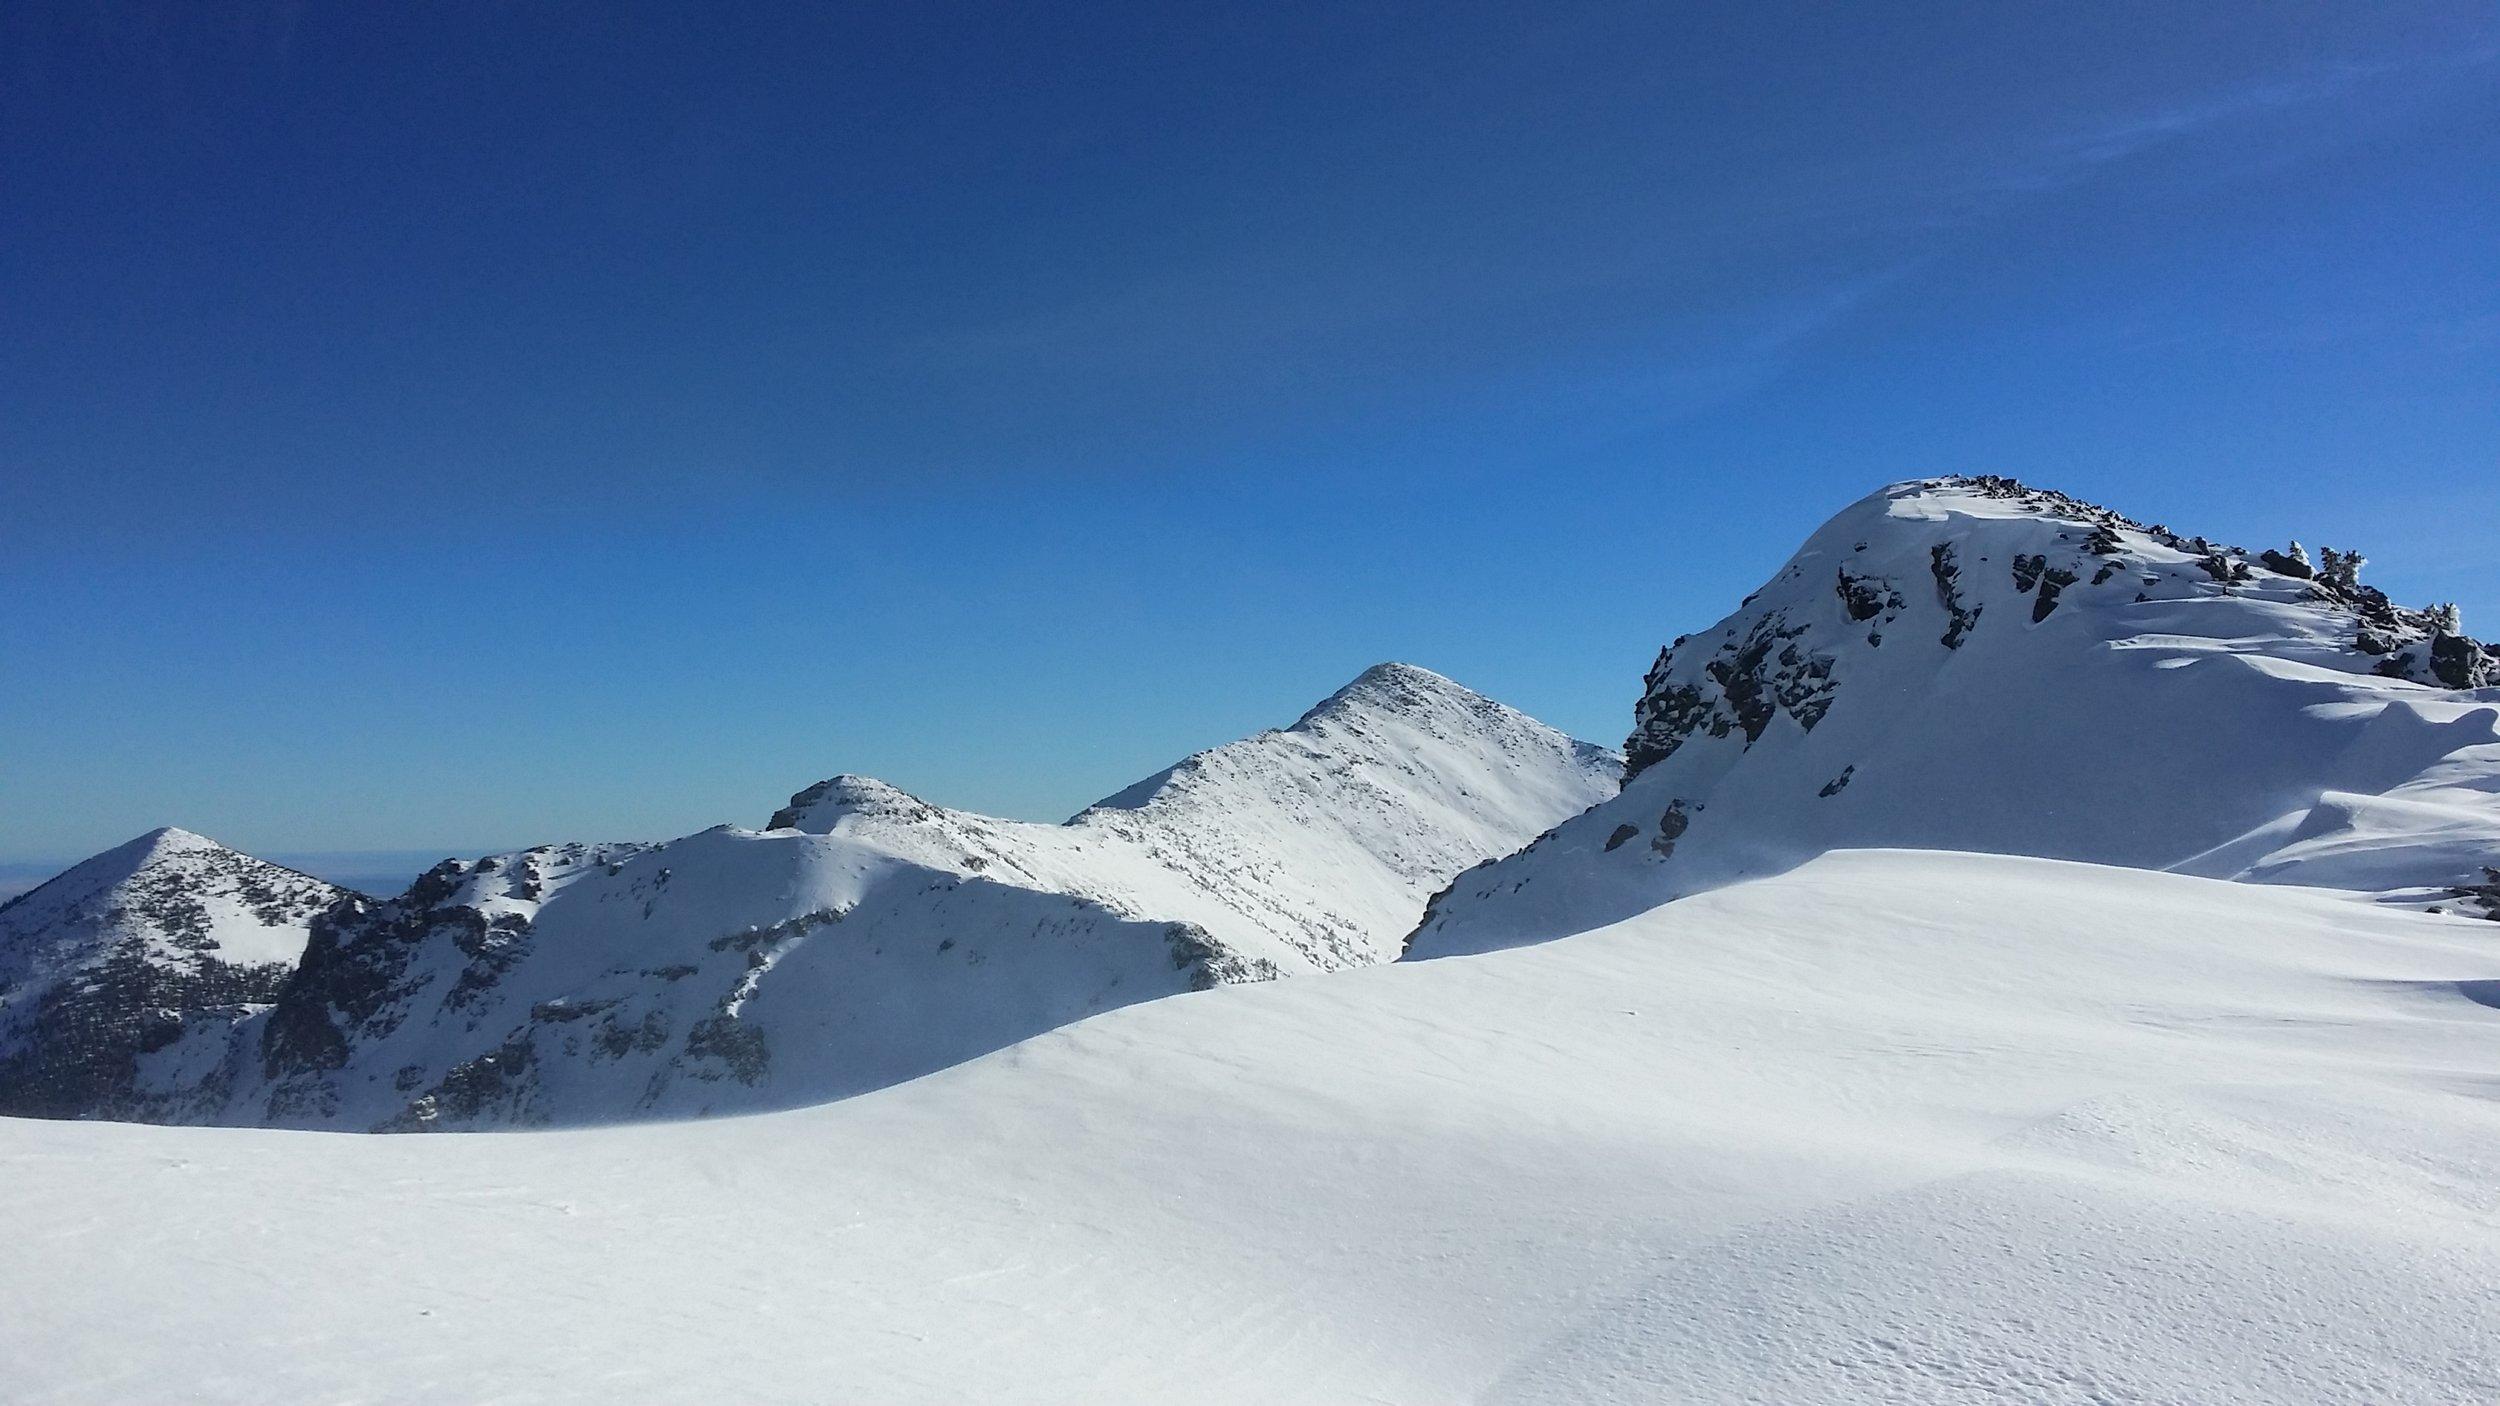 Looking down the ridge to Agassiz Peak